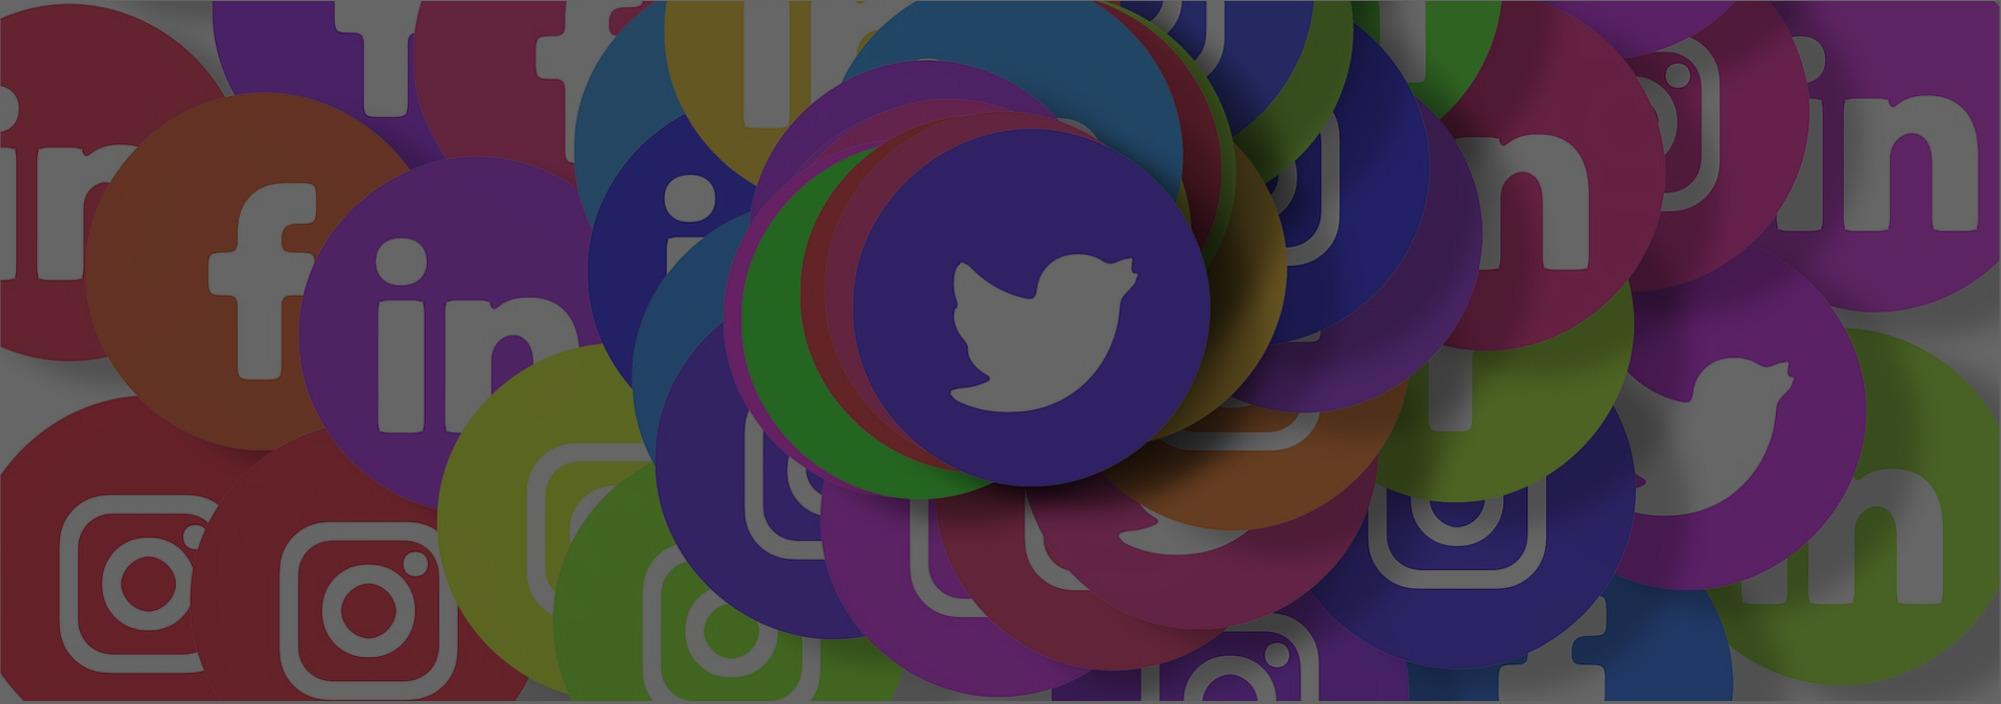 Social-engagement-banner